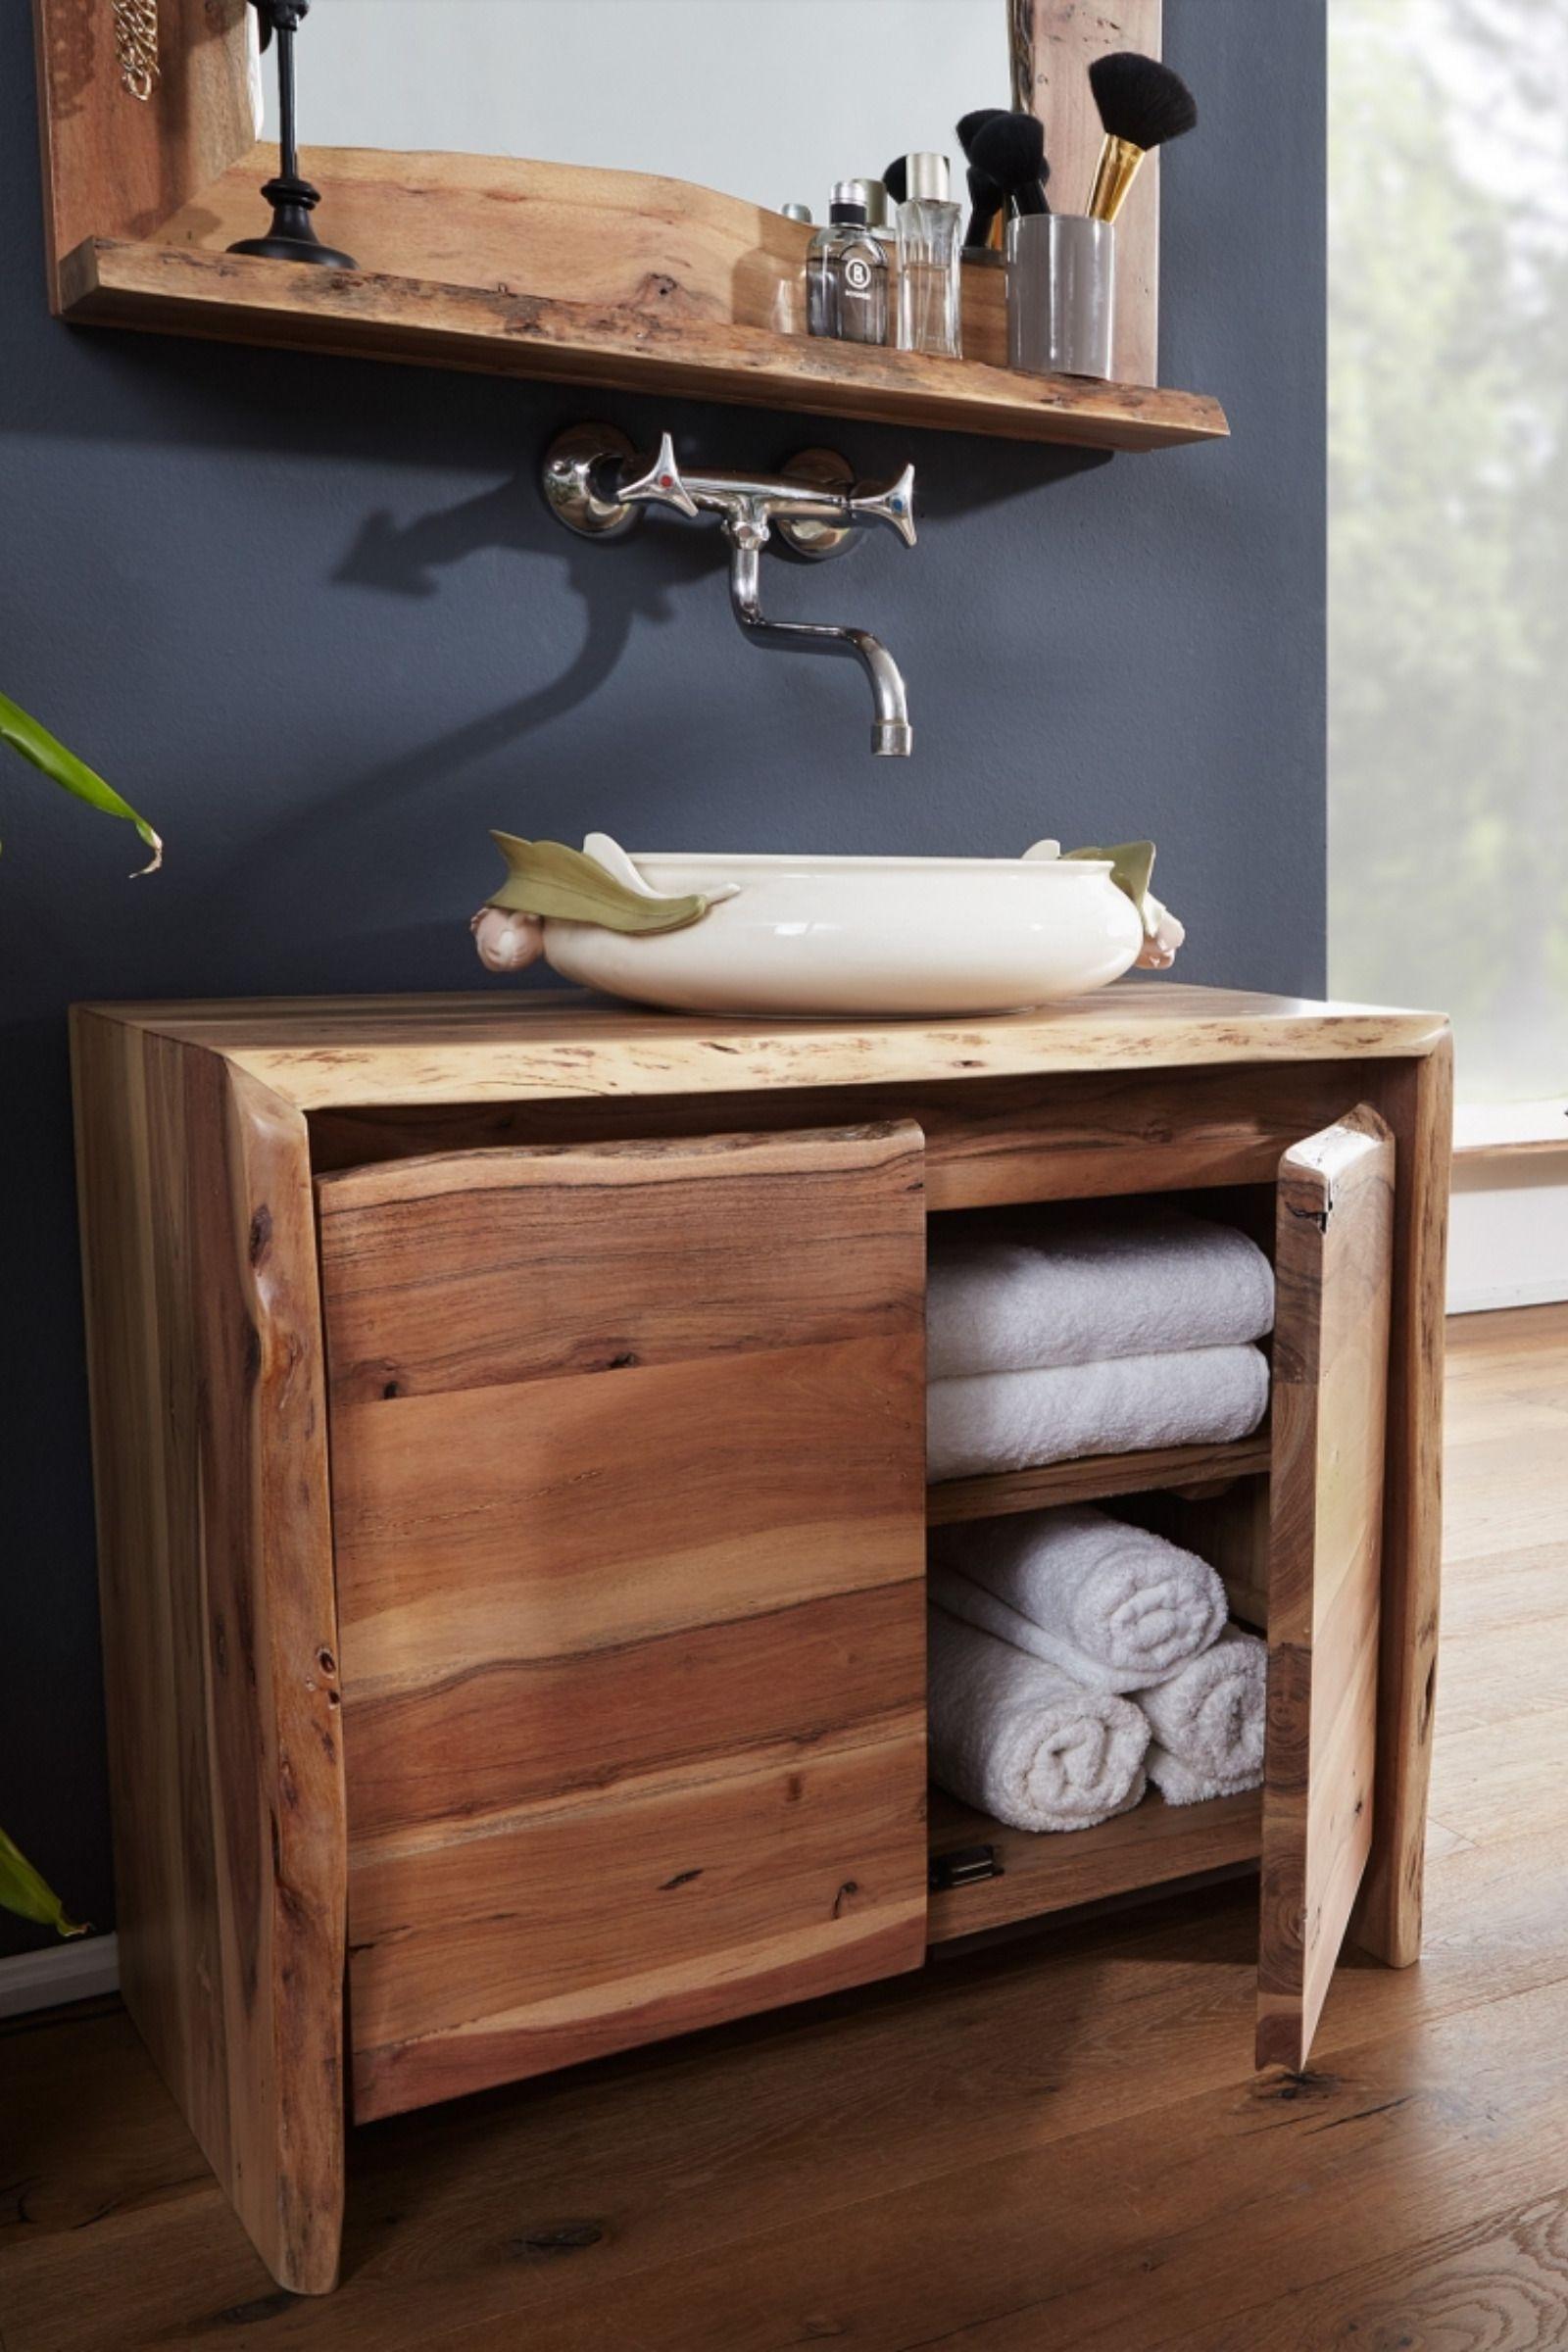 Baumkantenmobel Live Edge Versandfrei I Echtholz Mobel Mobel Wohnzimmer Waschbeckenunterschrank